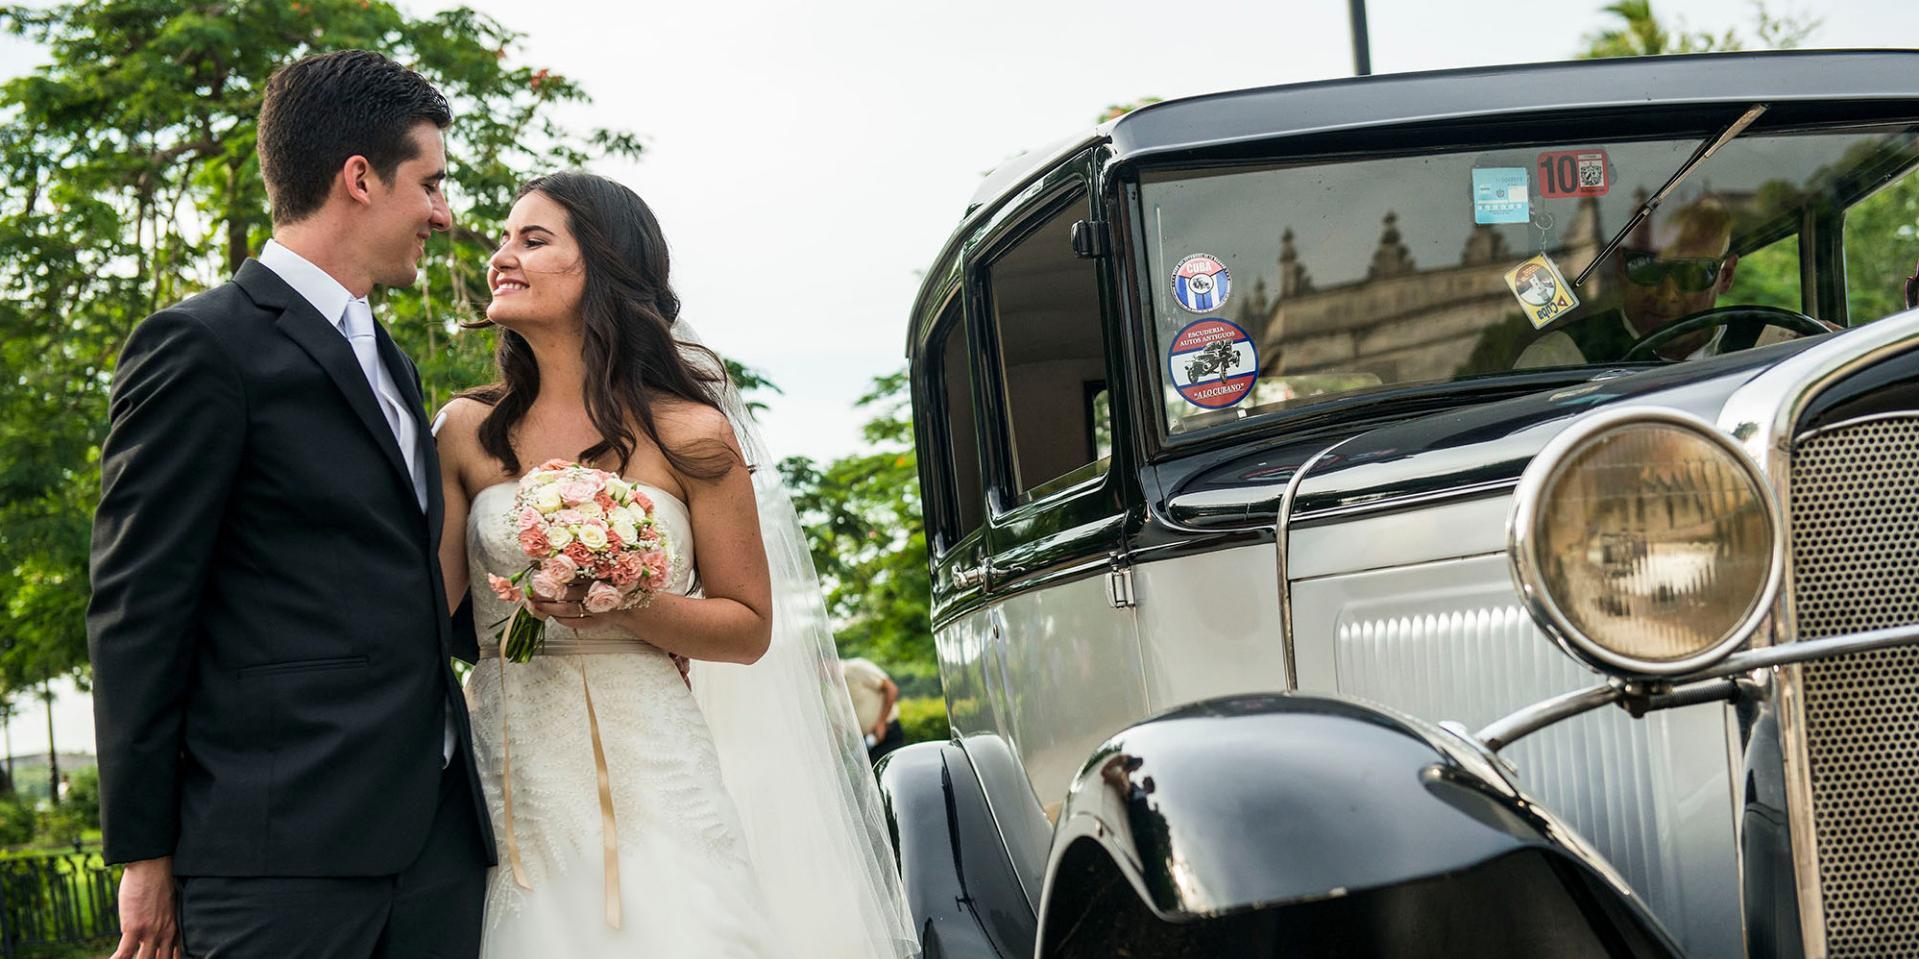 bodas-sin-clasificar-sin-tema-cuba-15541.jpg